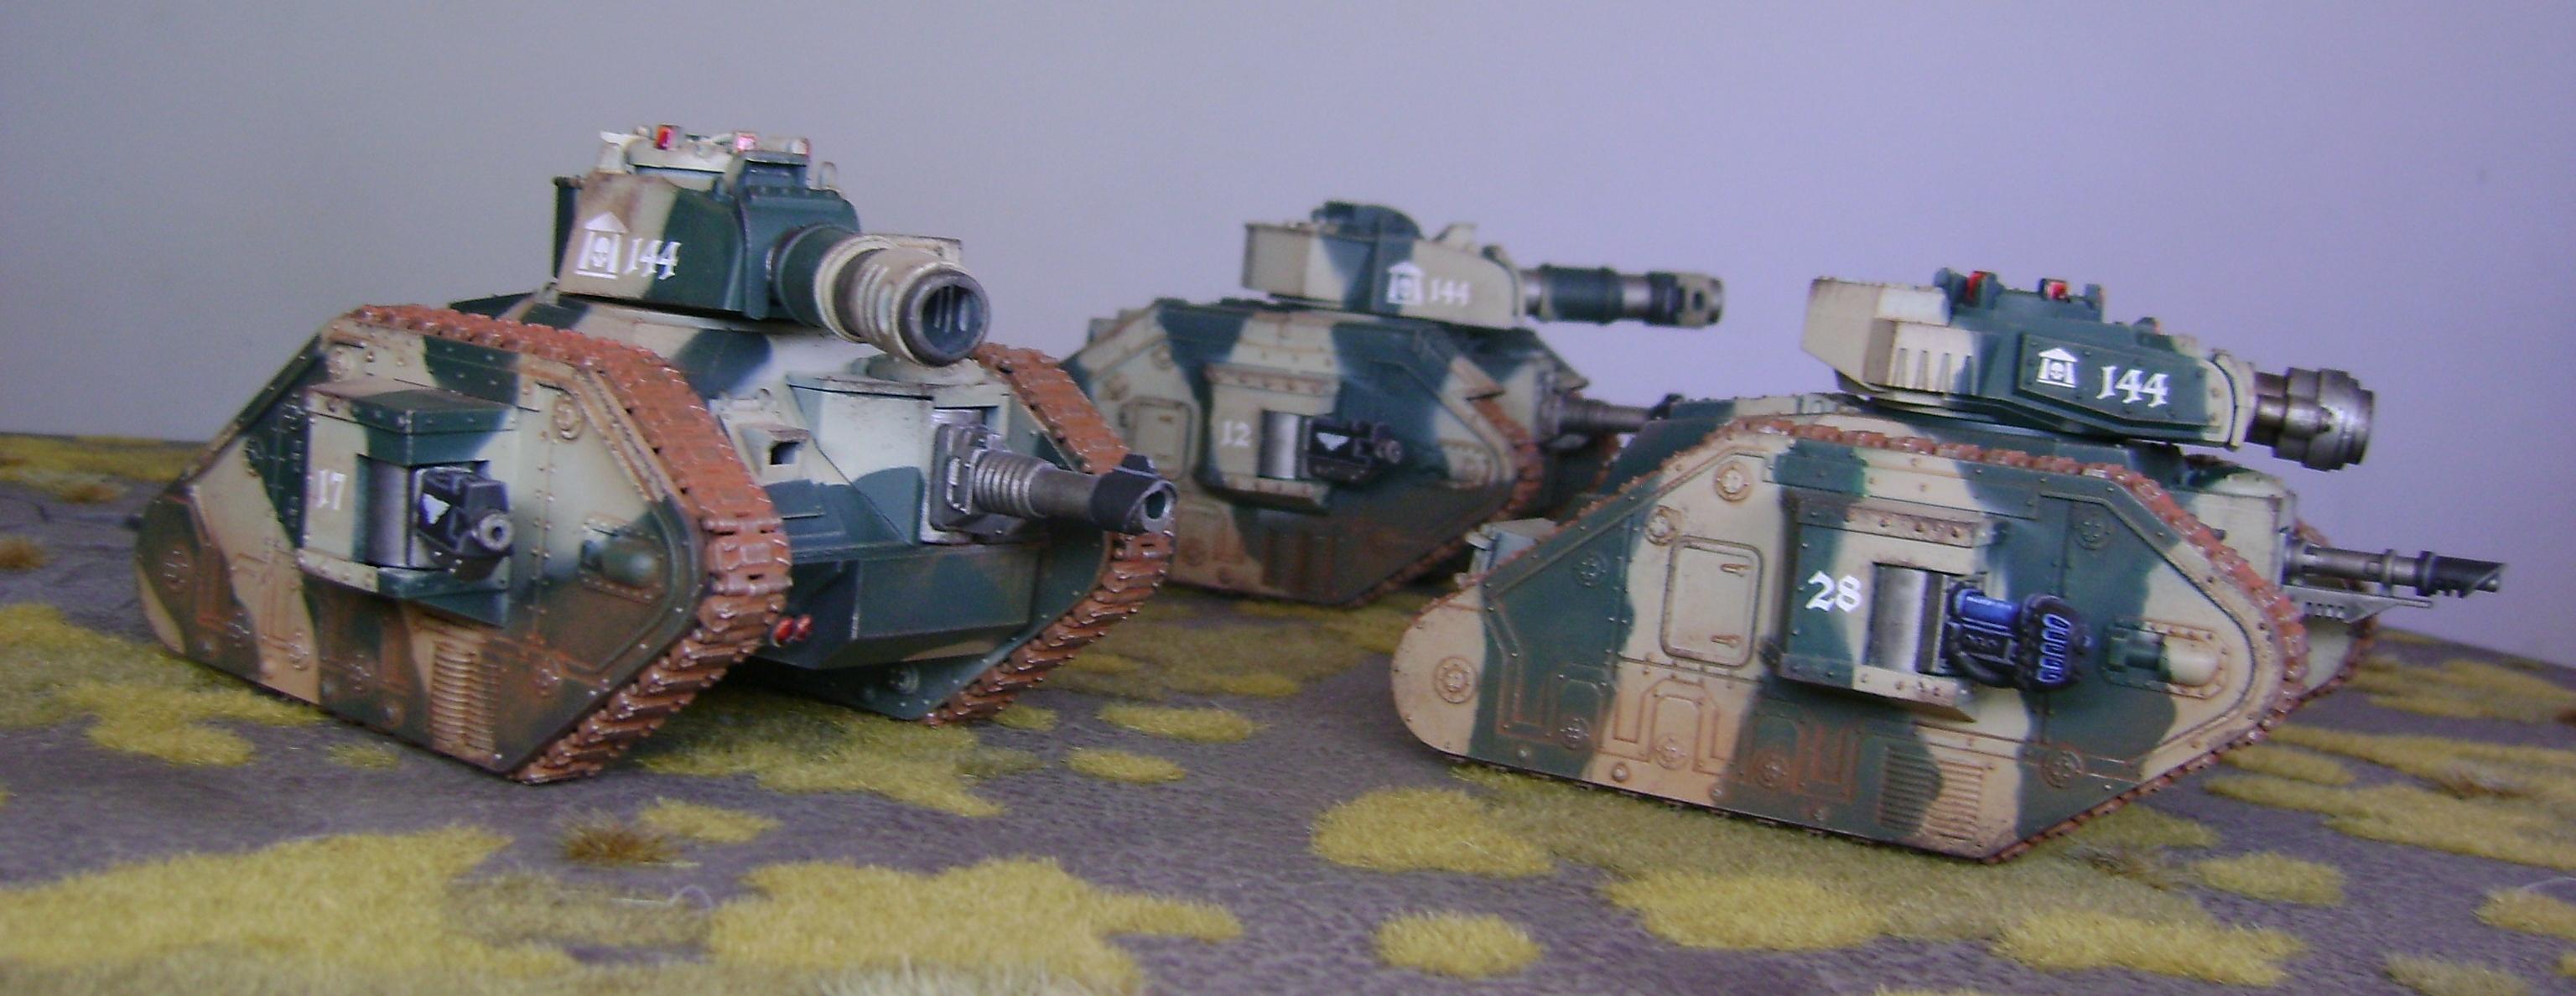 Cadians, Imperial Guard, Leman Russ